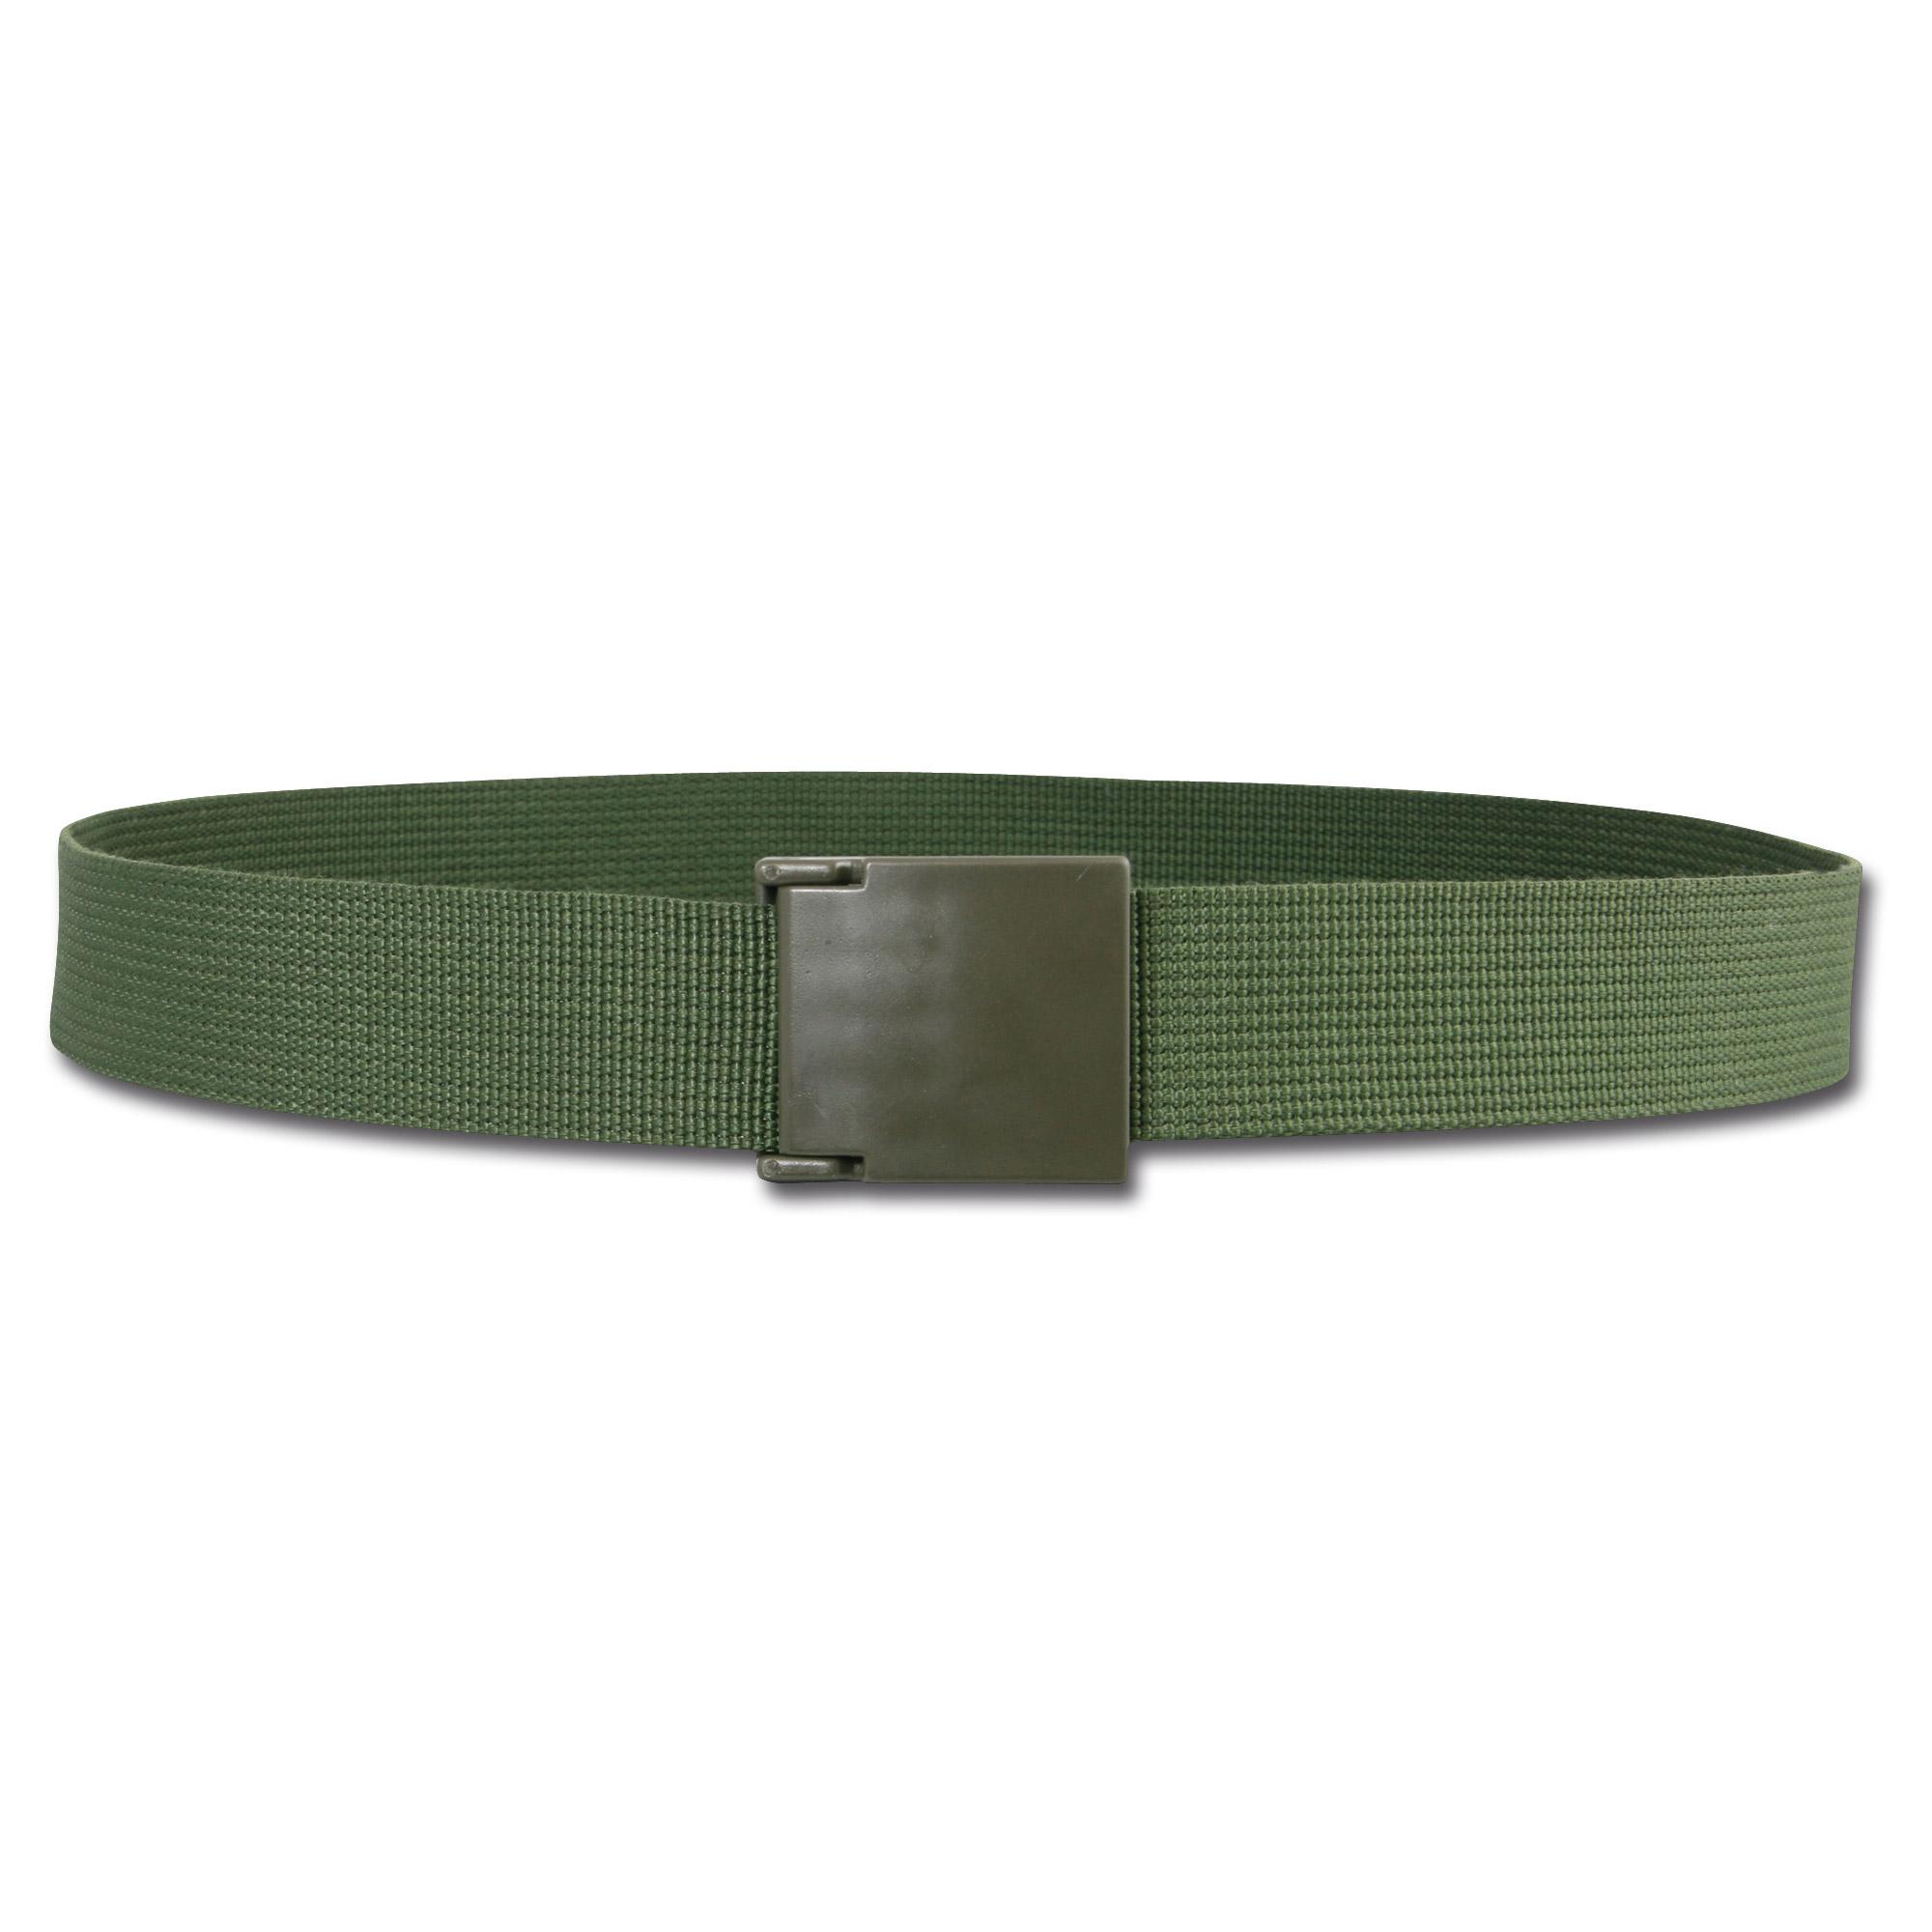 U.S. Belt Stealth MFH olive